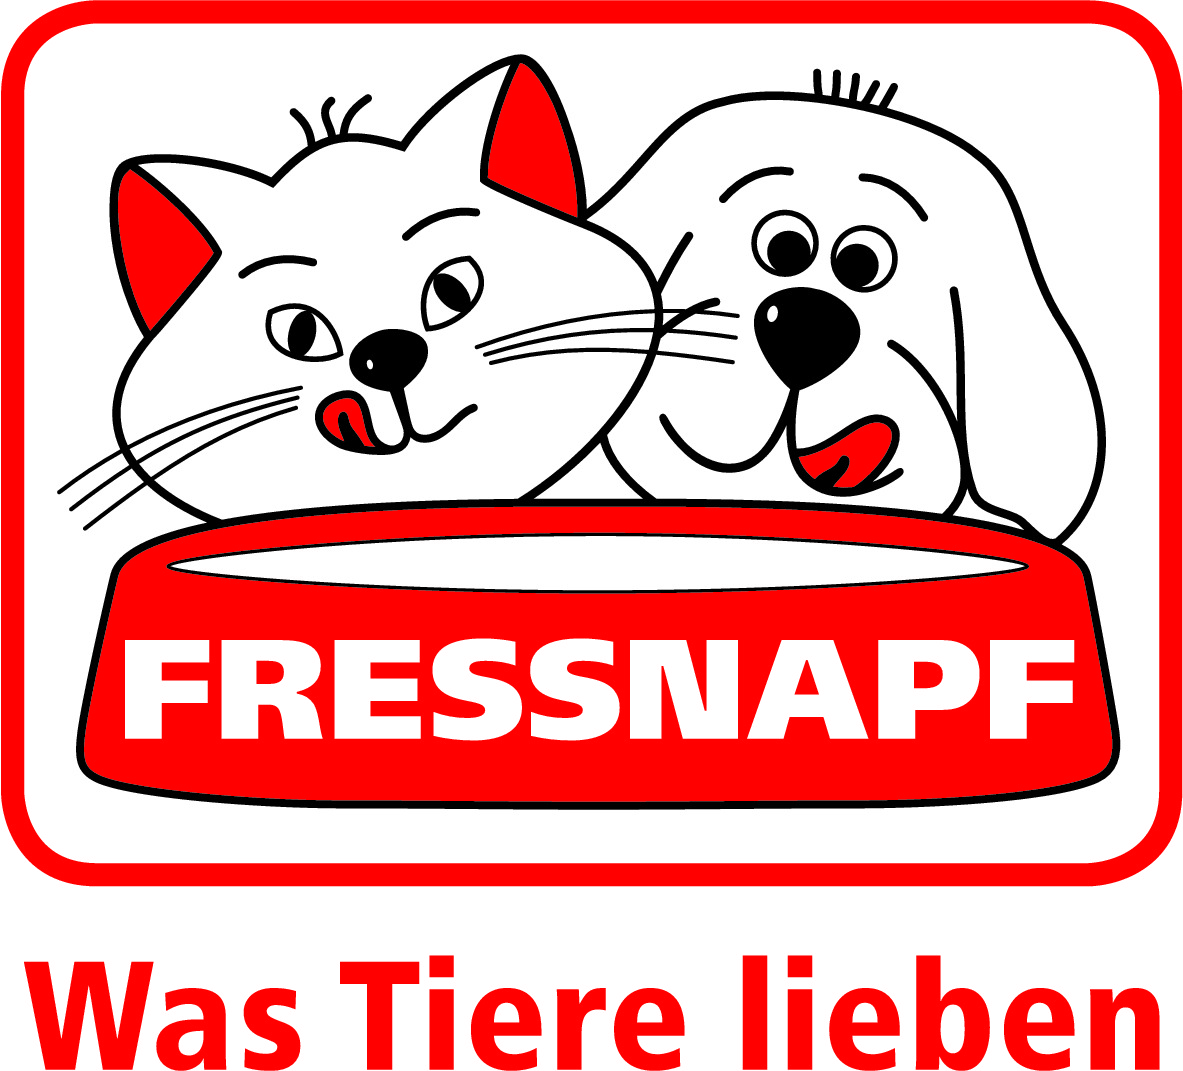 Fressnapf Steinfurt